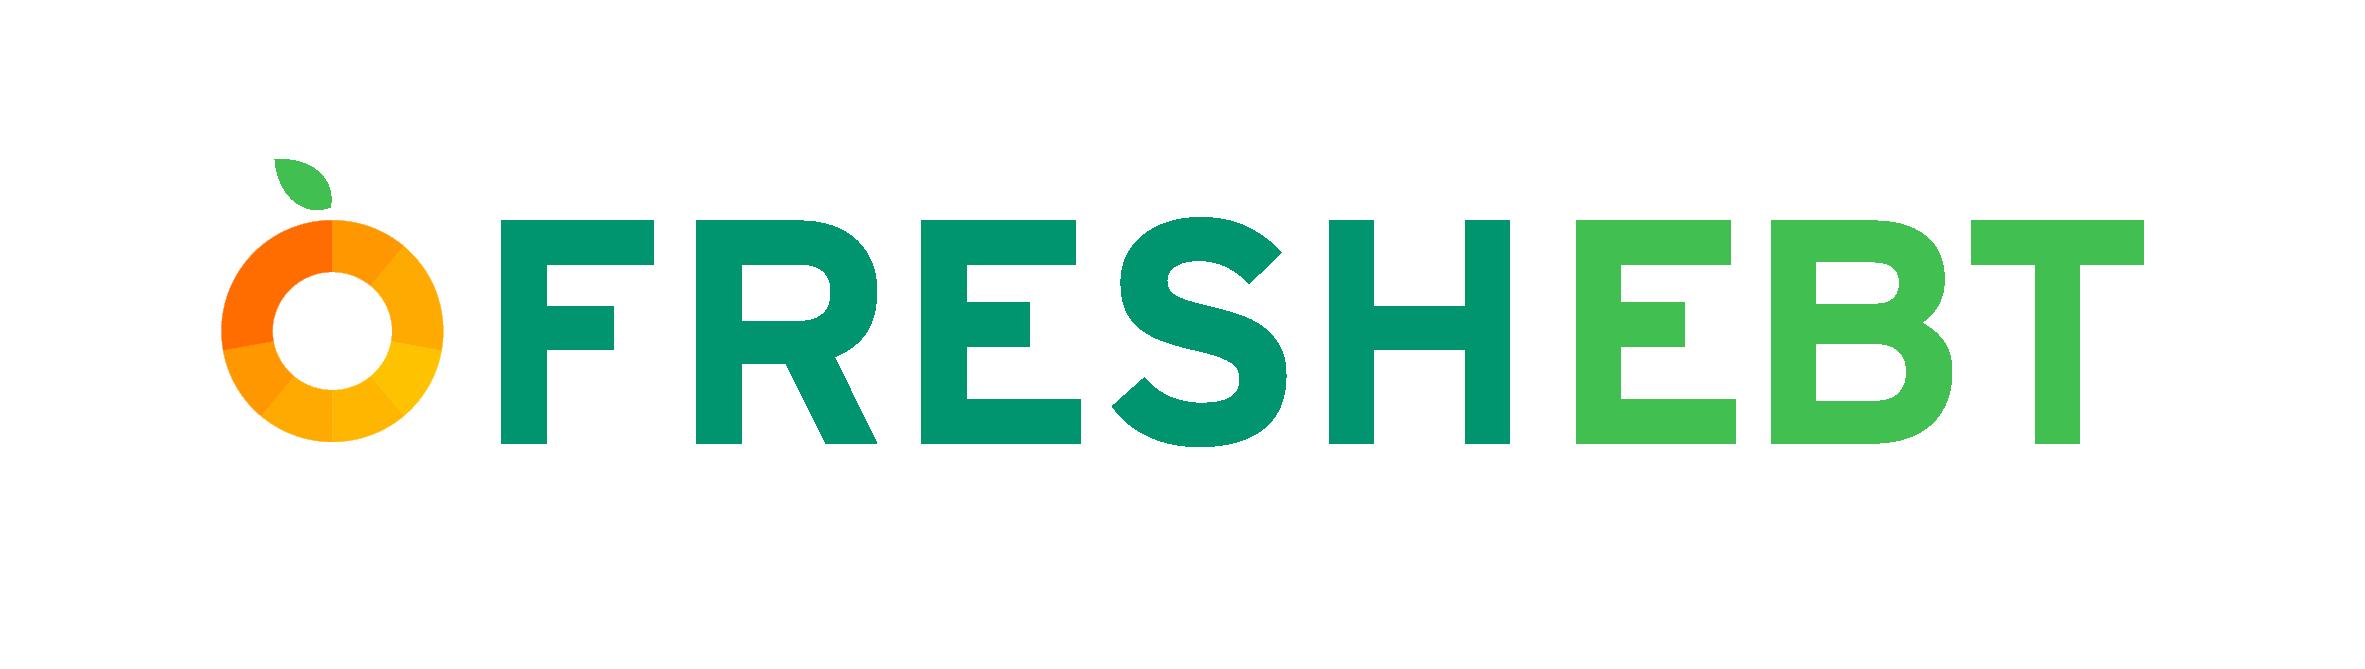 fresh-EBT-logo-horizontal-1-transparent.png